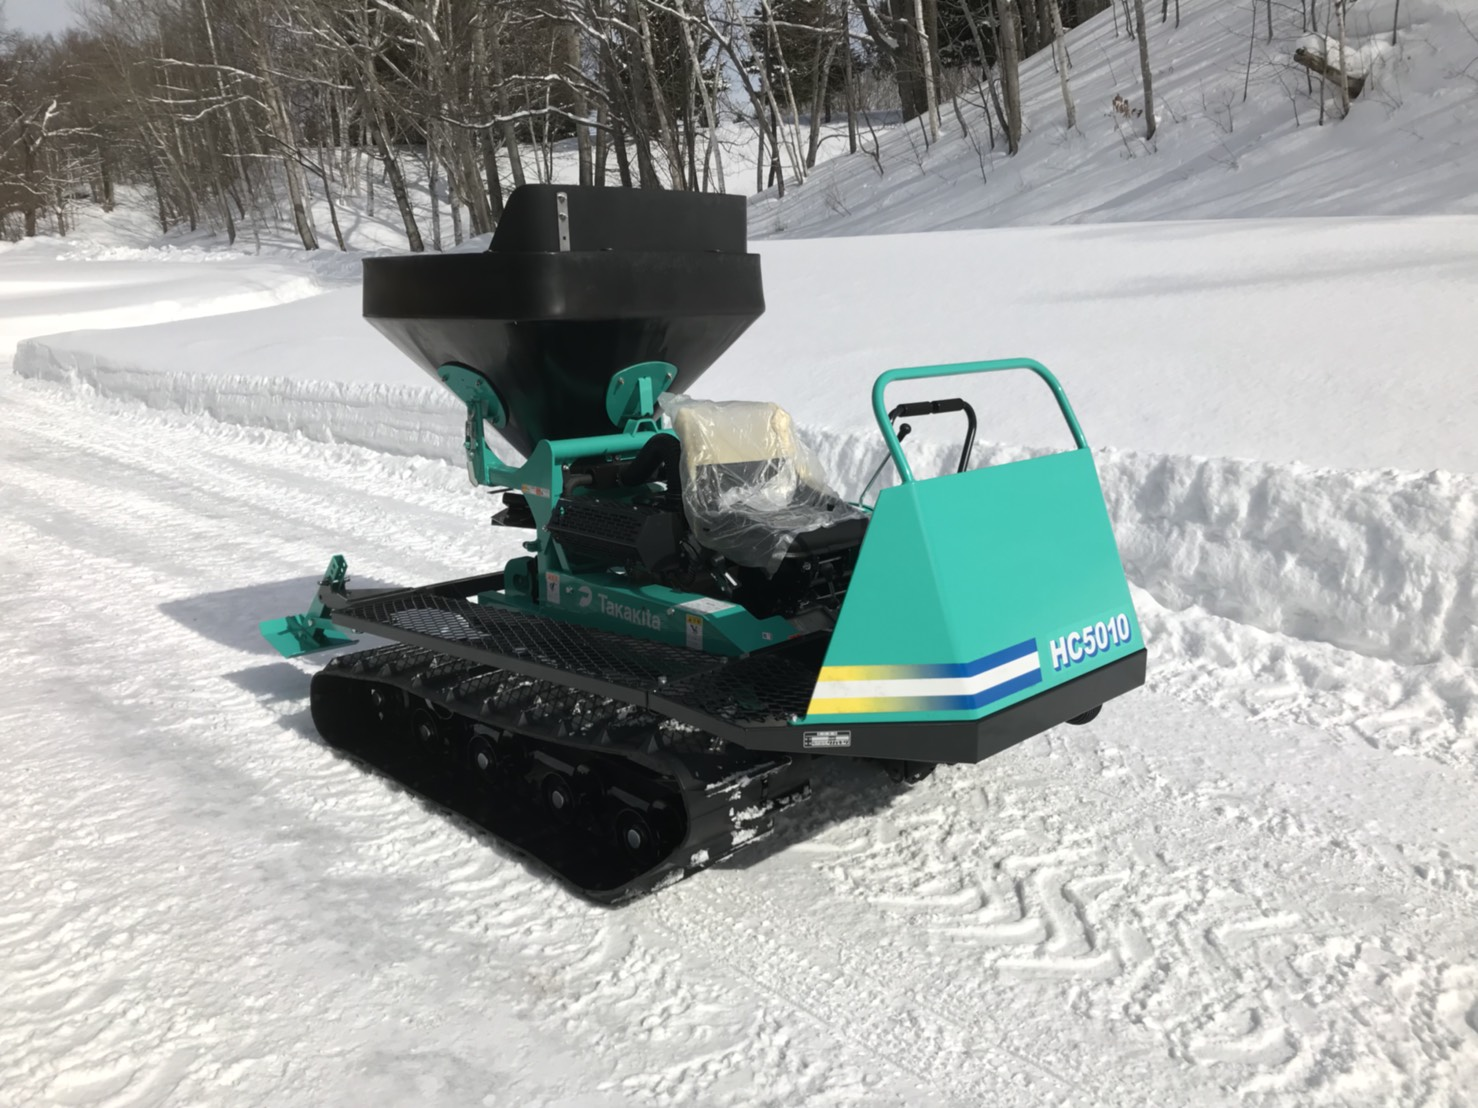 ■2/23UP 融雪作業準備中です!